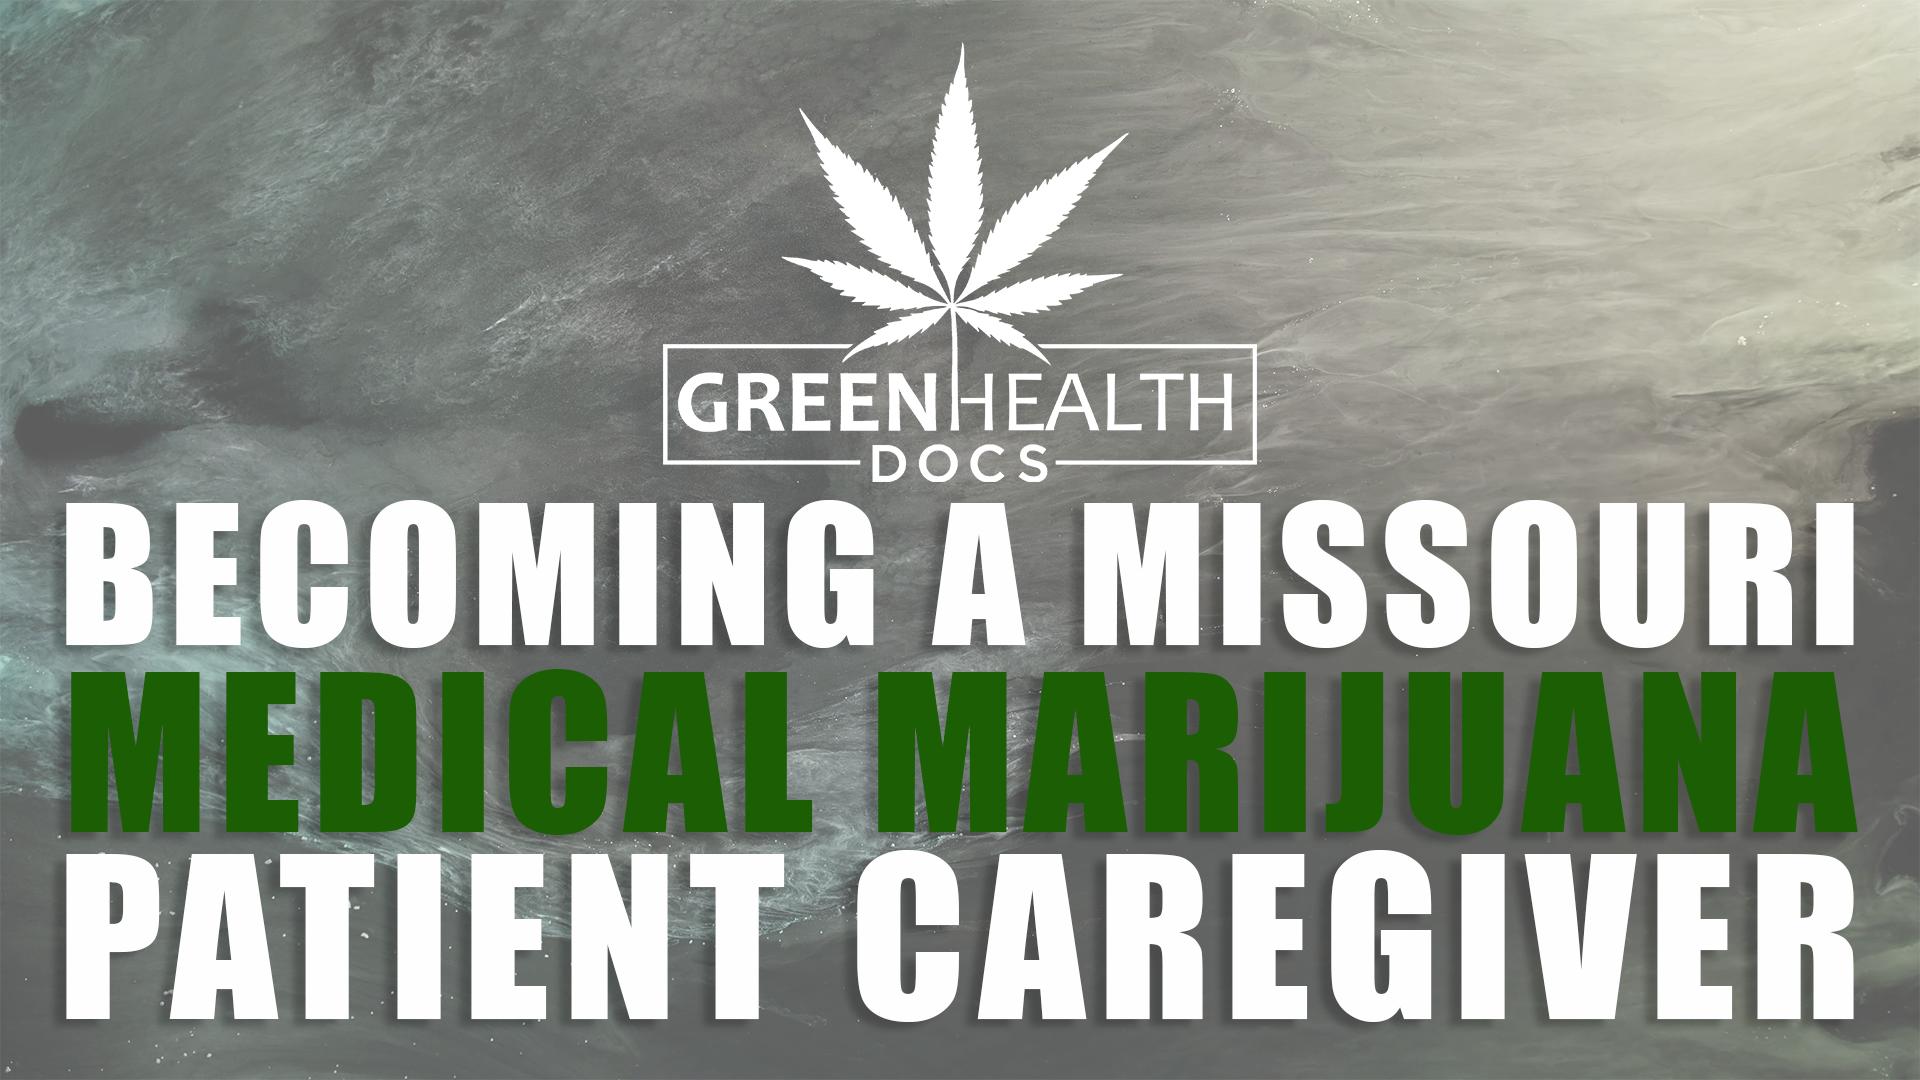 Medical Marijuana Patient Caregiver